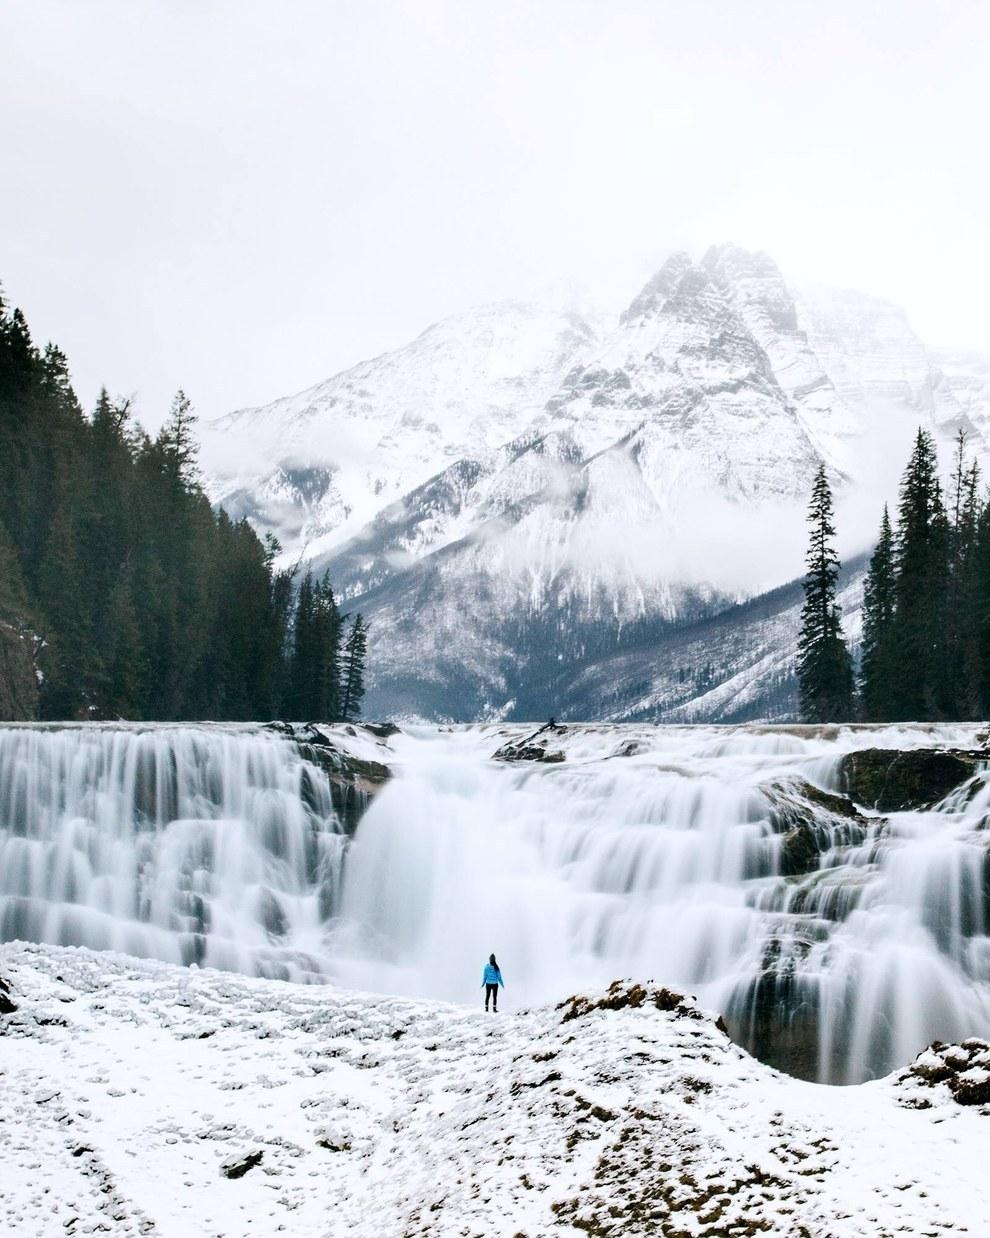 Wapta Falls in Canada